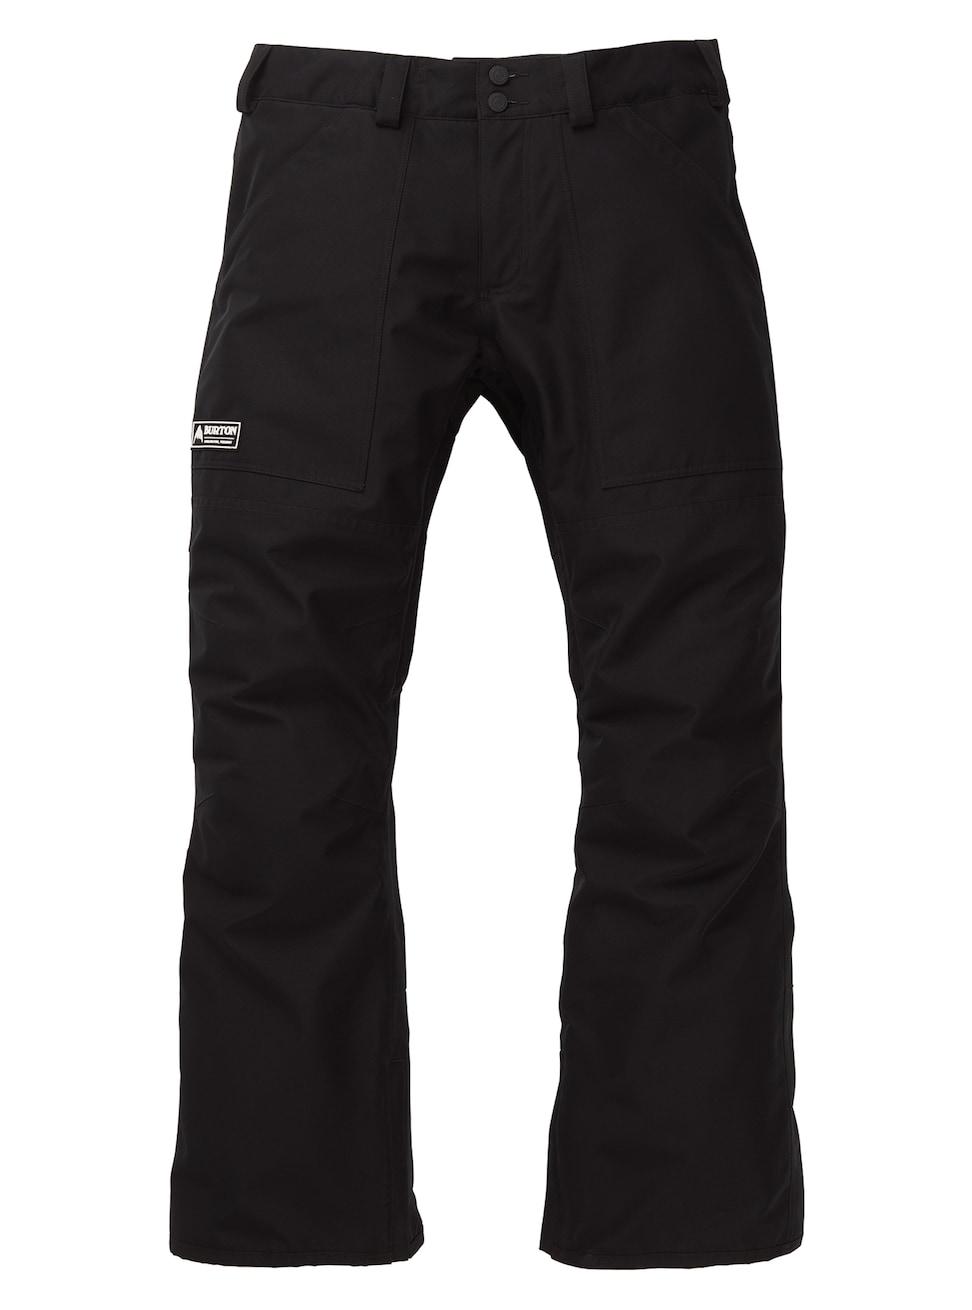 Burton Gore Ballast Pant True Black 2020